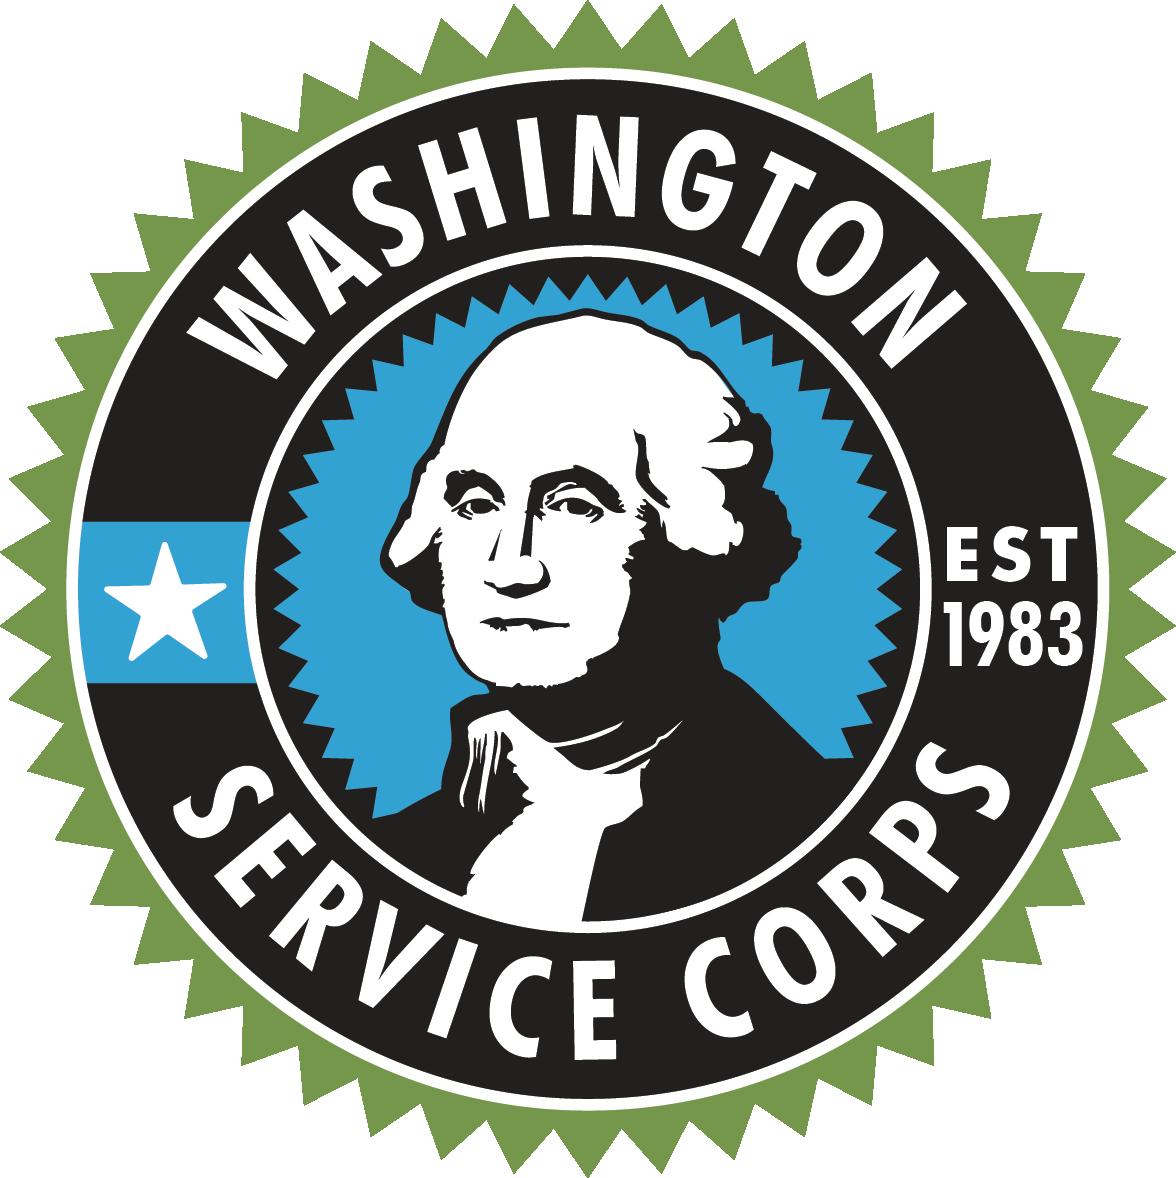 Washington Service Corps.png